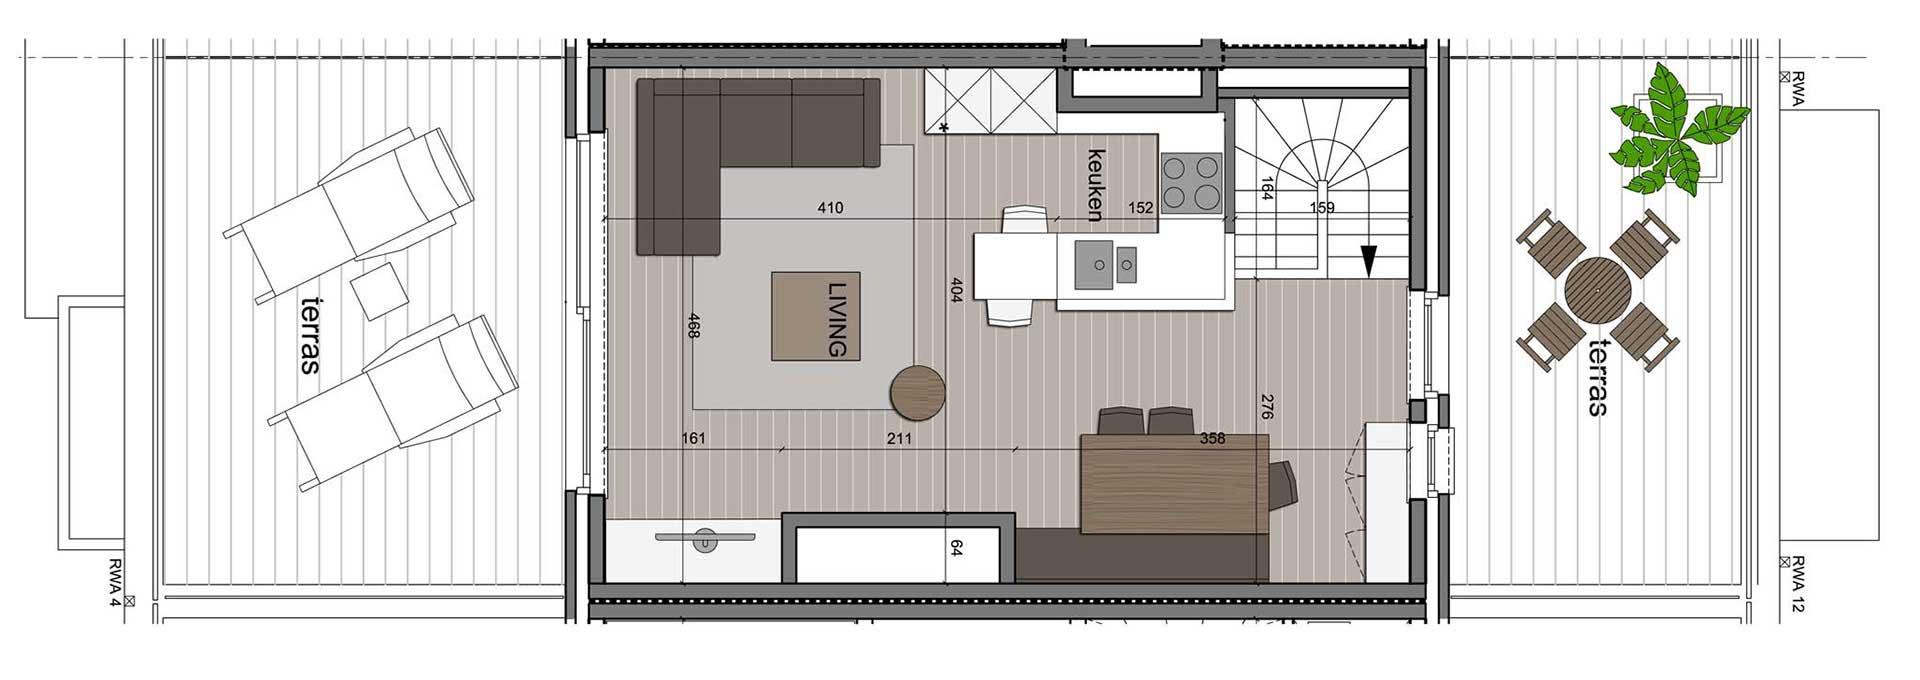 Residentie <br /> Winoc - image nieuwbouwappartement-koksijde-residentie-winoc-6.2.2 on https://hoprom.be